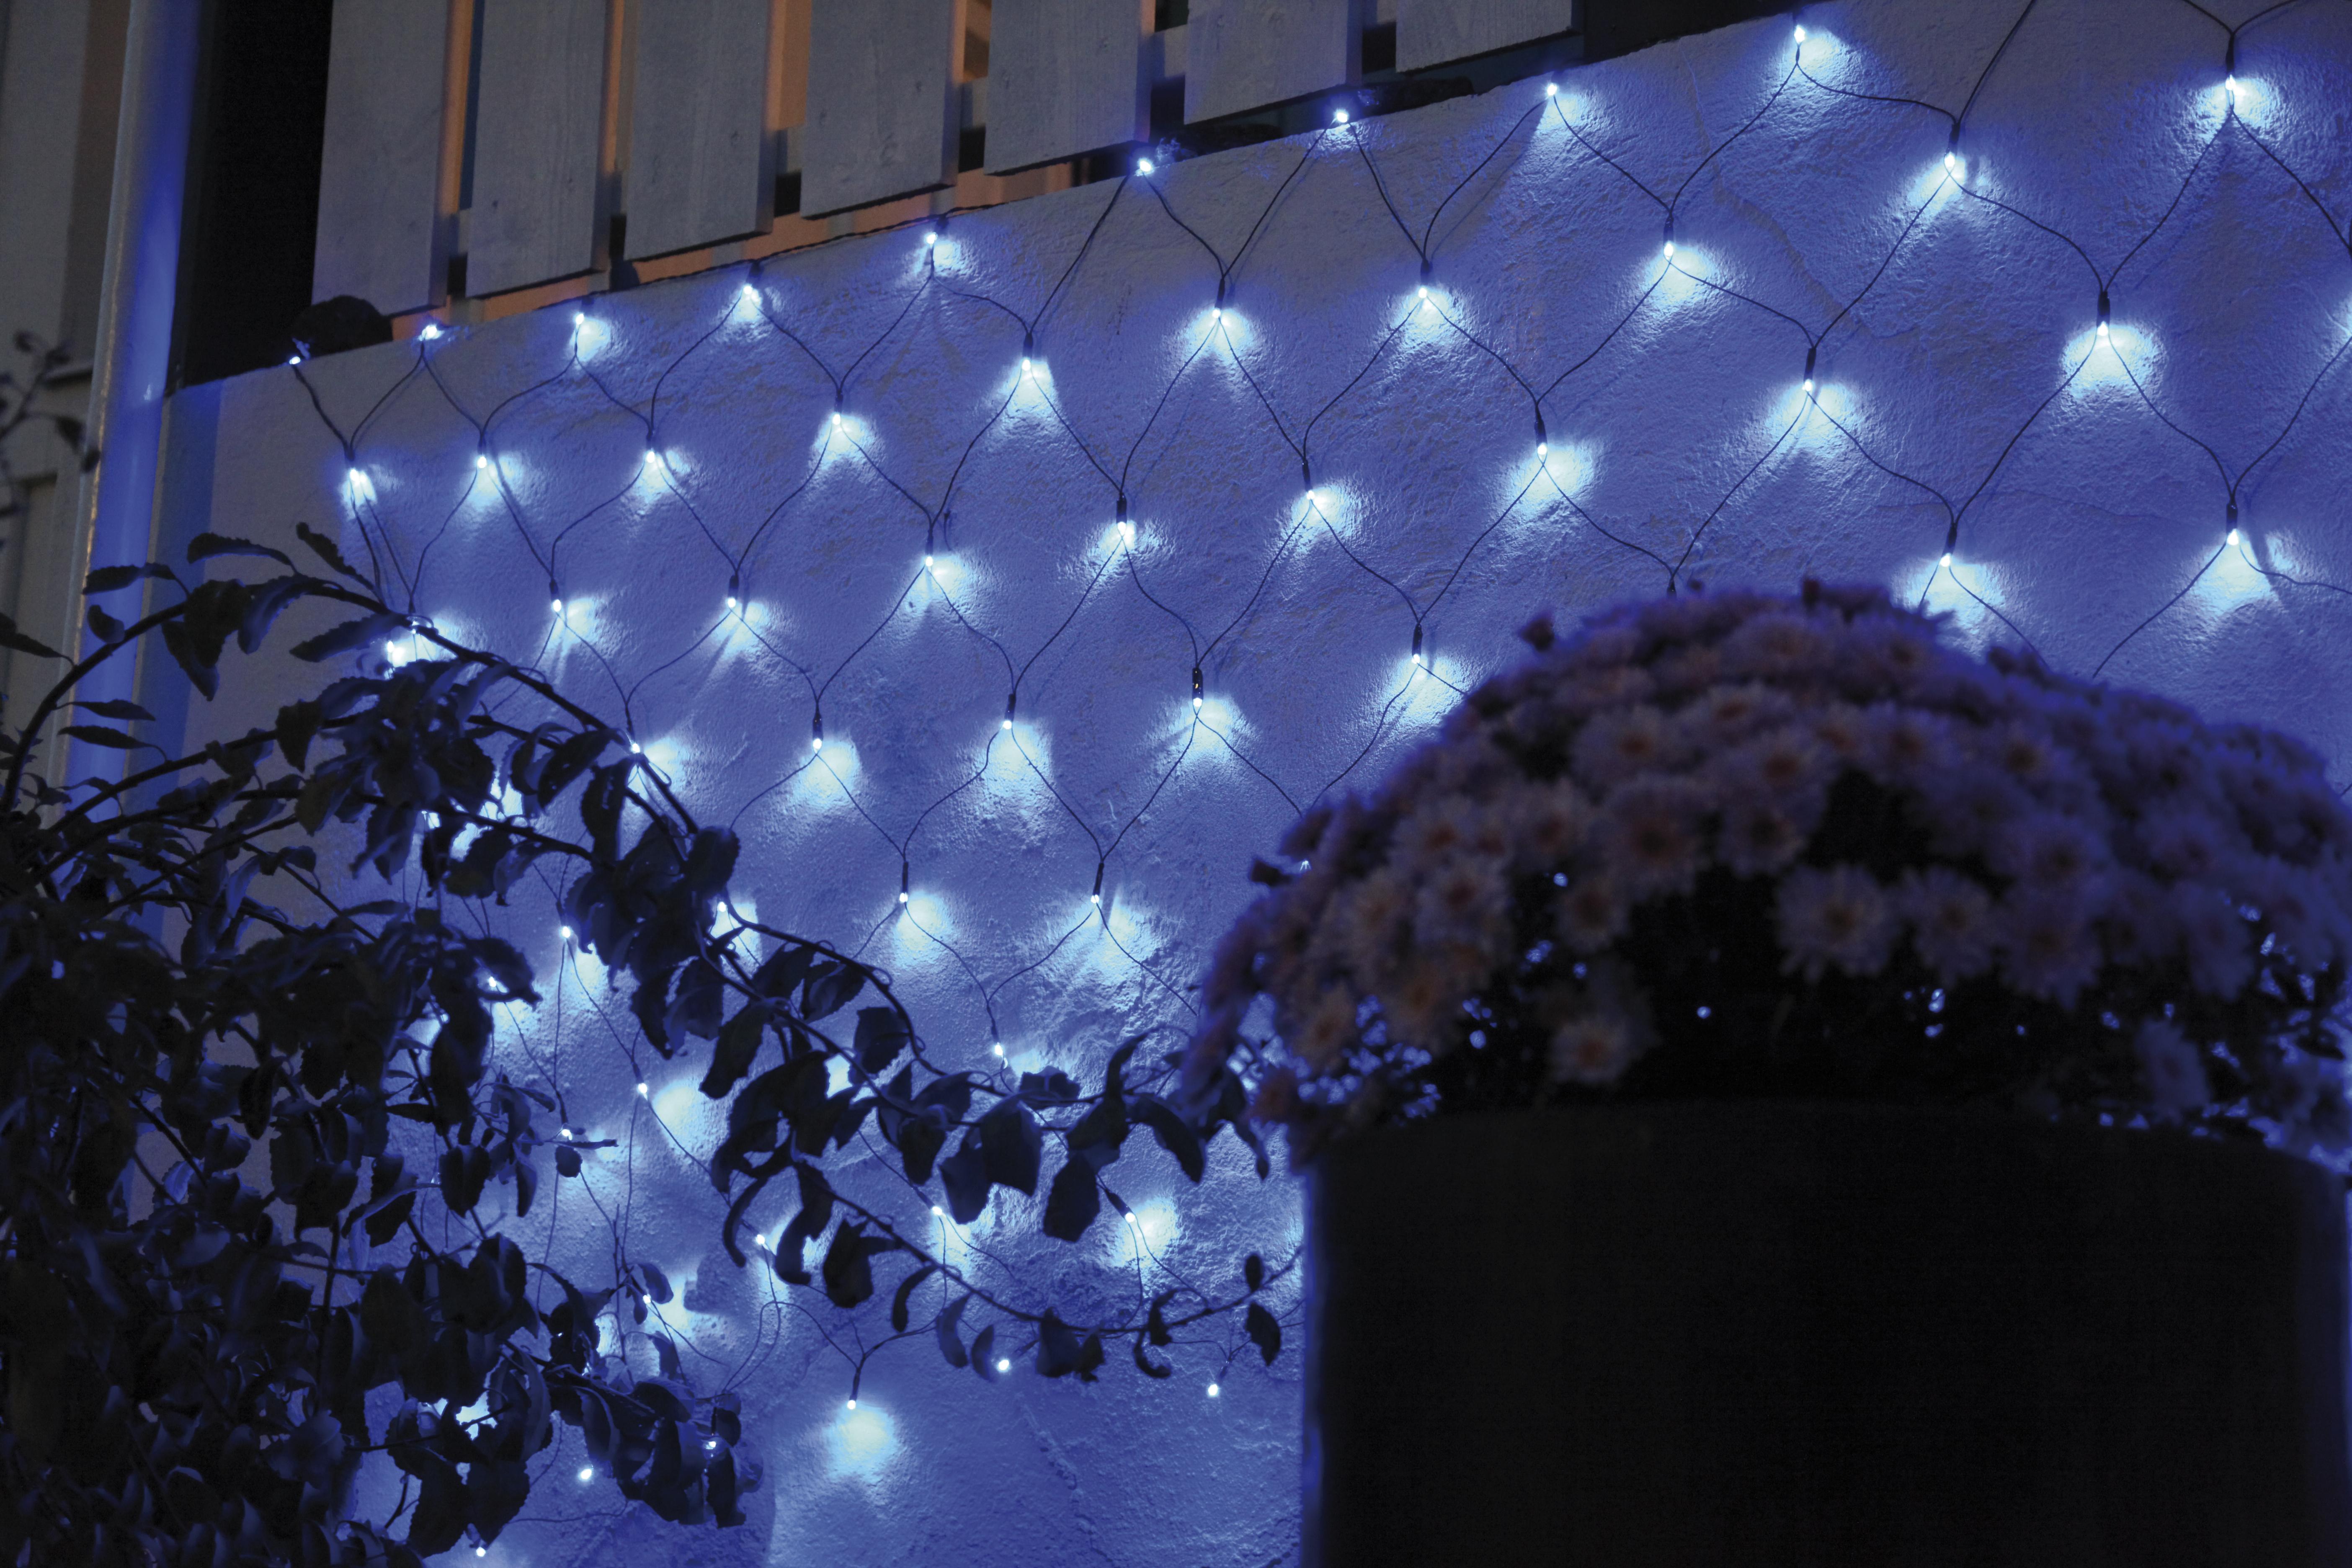 ca Best Season LED-Lichternetz 2 x 1 m 498-69 90-teilig